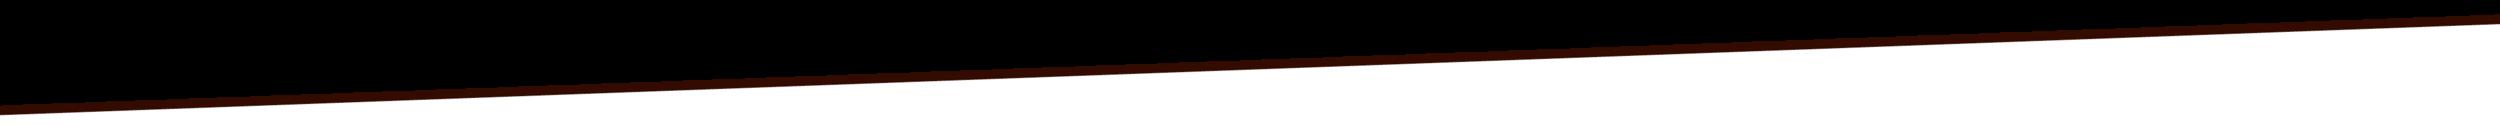 Liebl_Bedachungen_Webseite_Background_V1_2.png